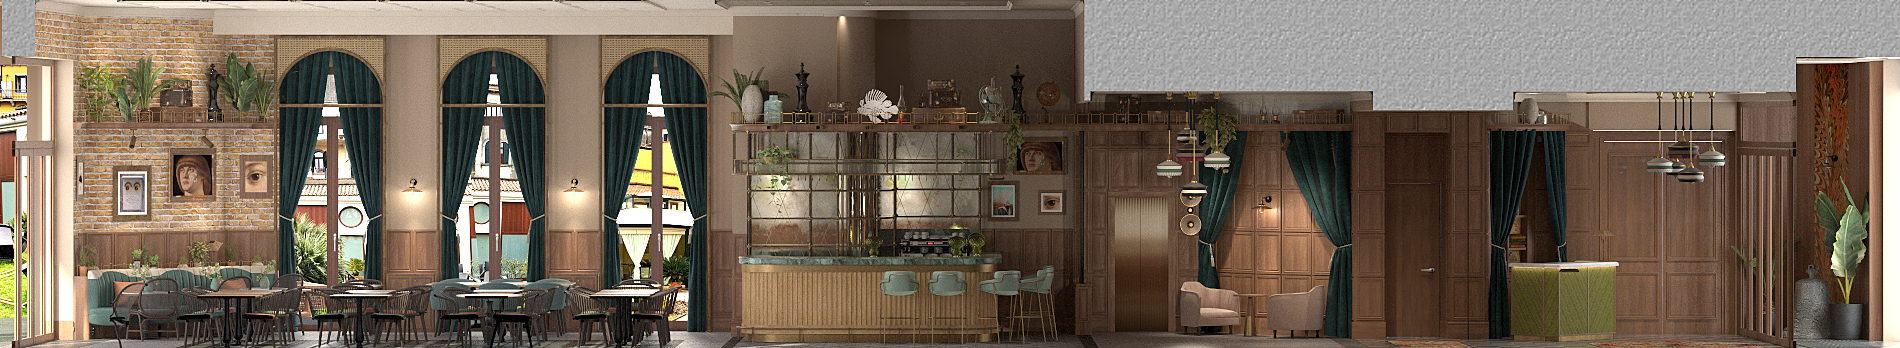 Indigo Hotel Venice - Rendering Lobby & Bar